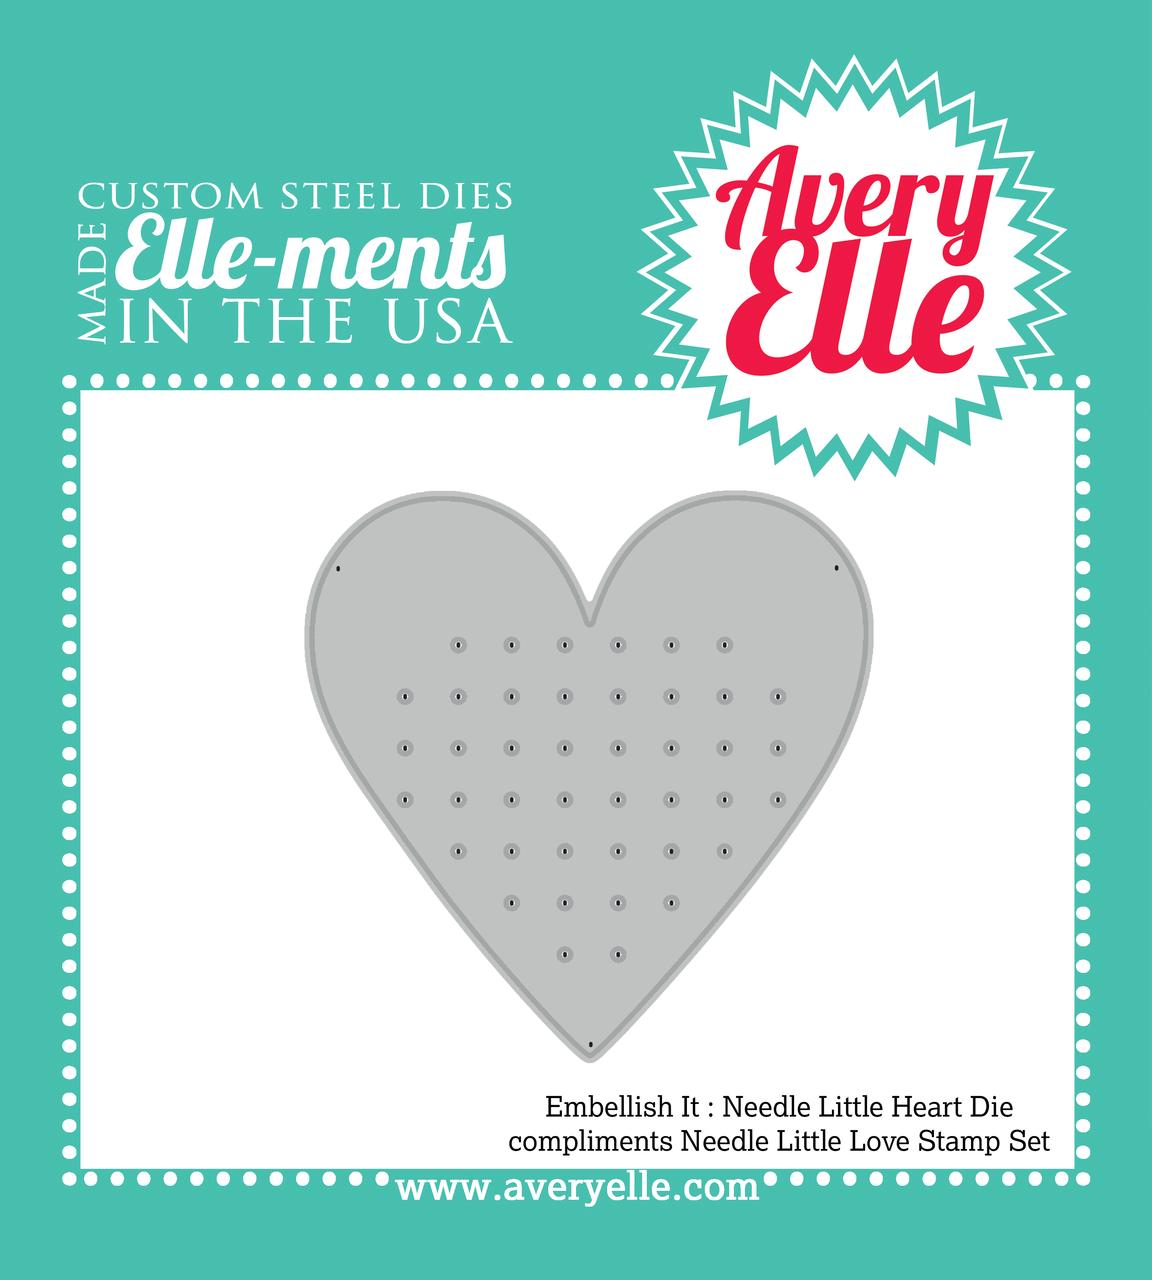 Embellish It Needle Little Love Elle-ments Die